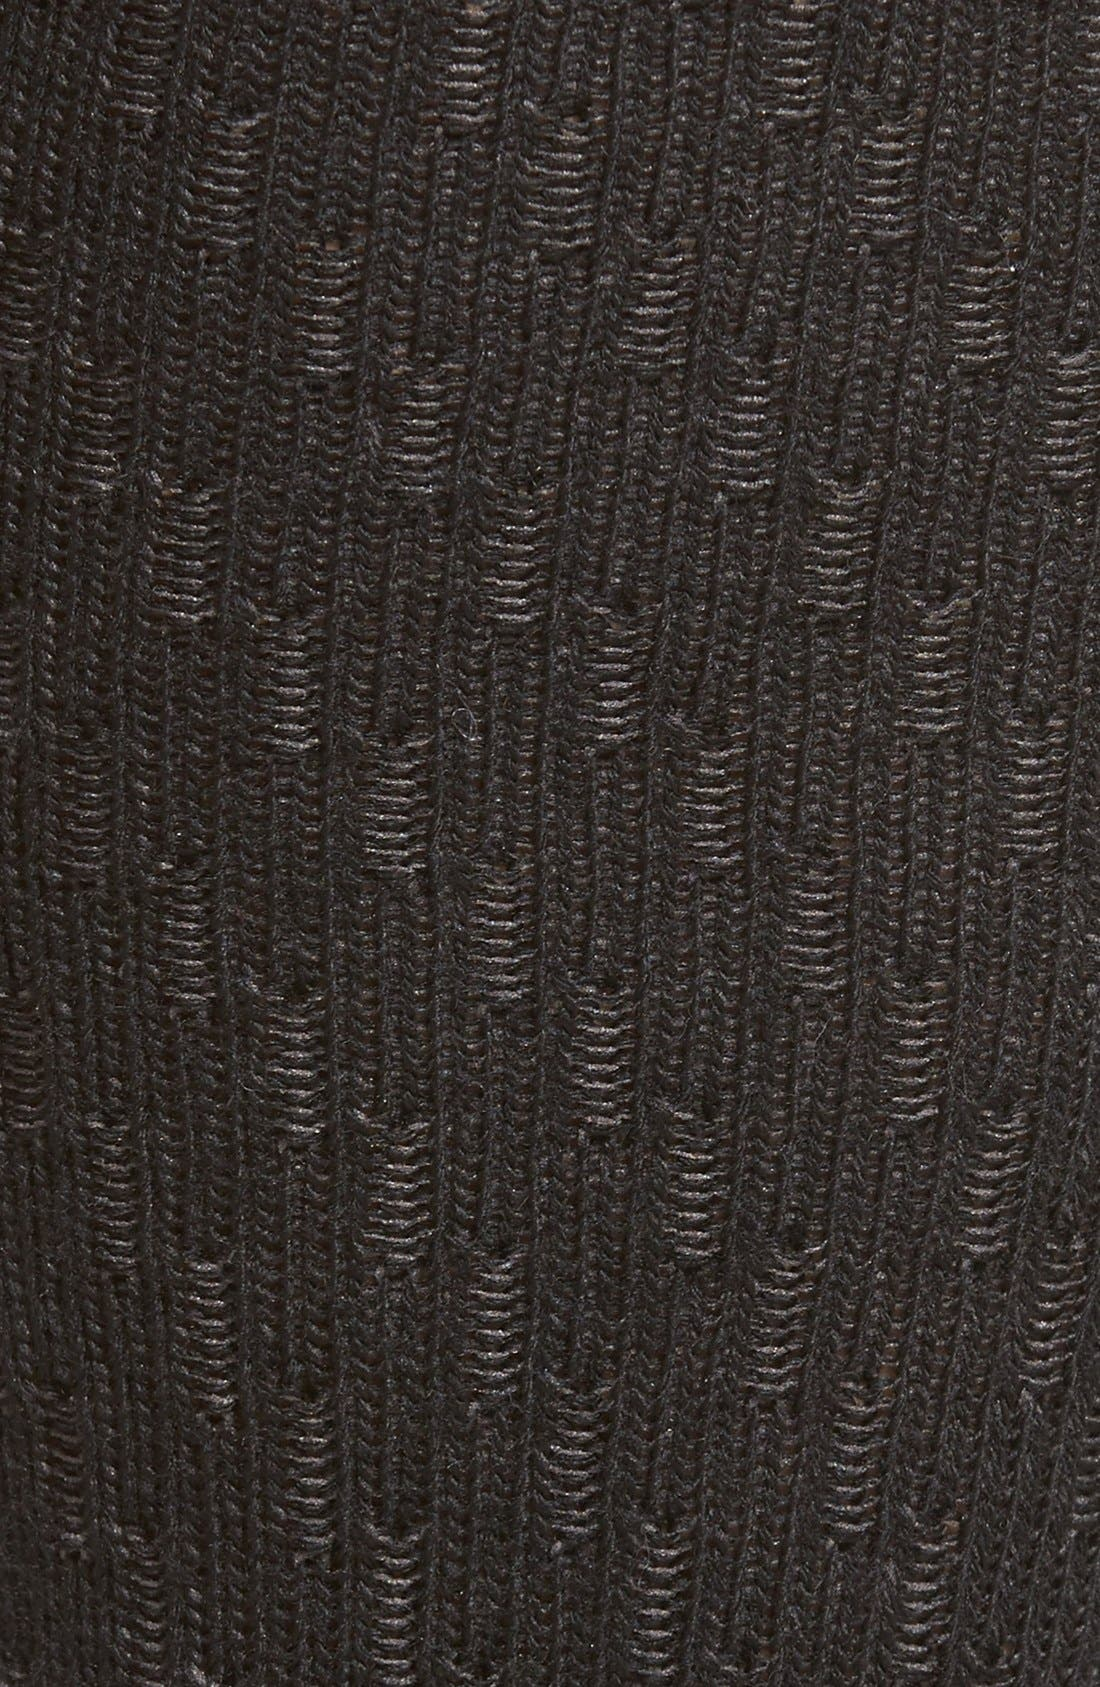 Alternate Image 2  - Wigwam 'Retro Lilly' Merino Wool Blend Knee High Socks